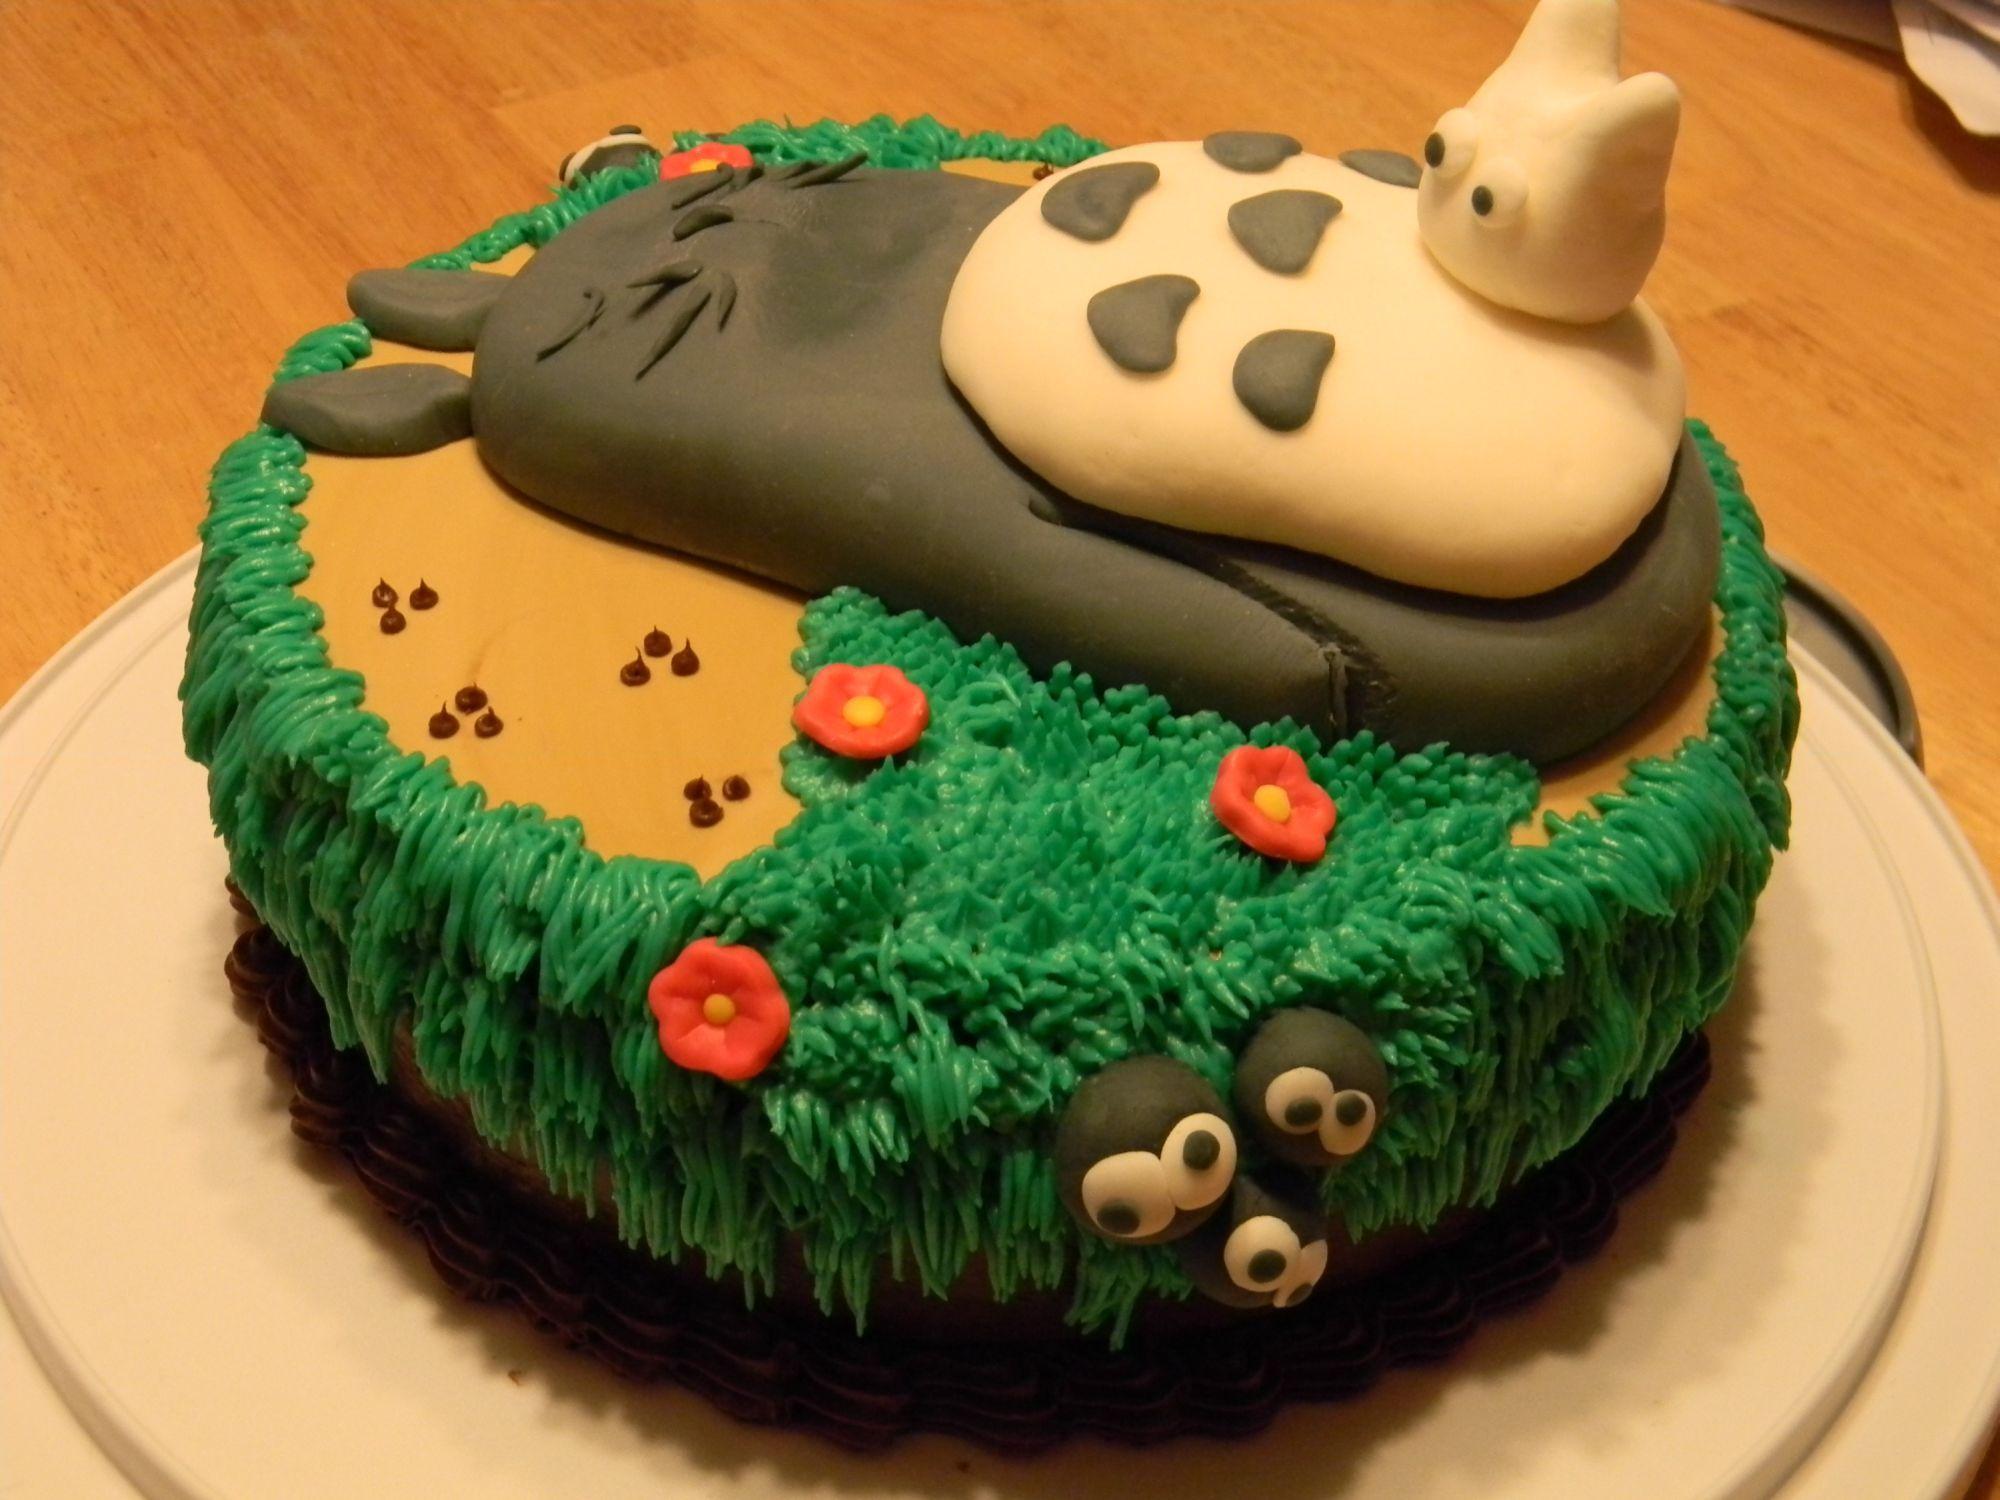 Anime Inspired Cakes Studio Ghibli